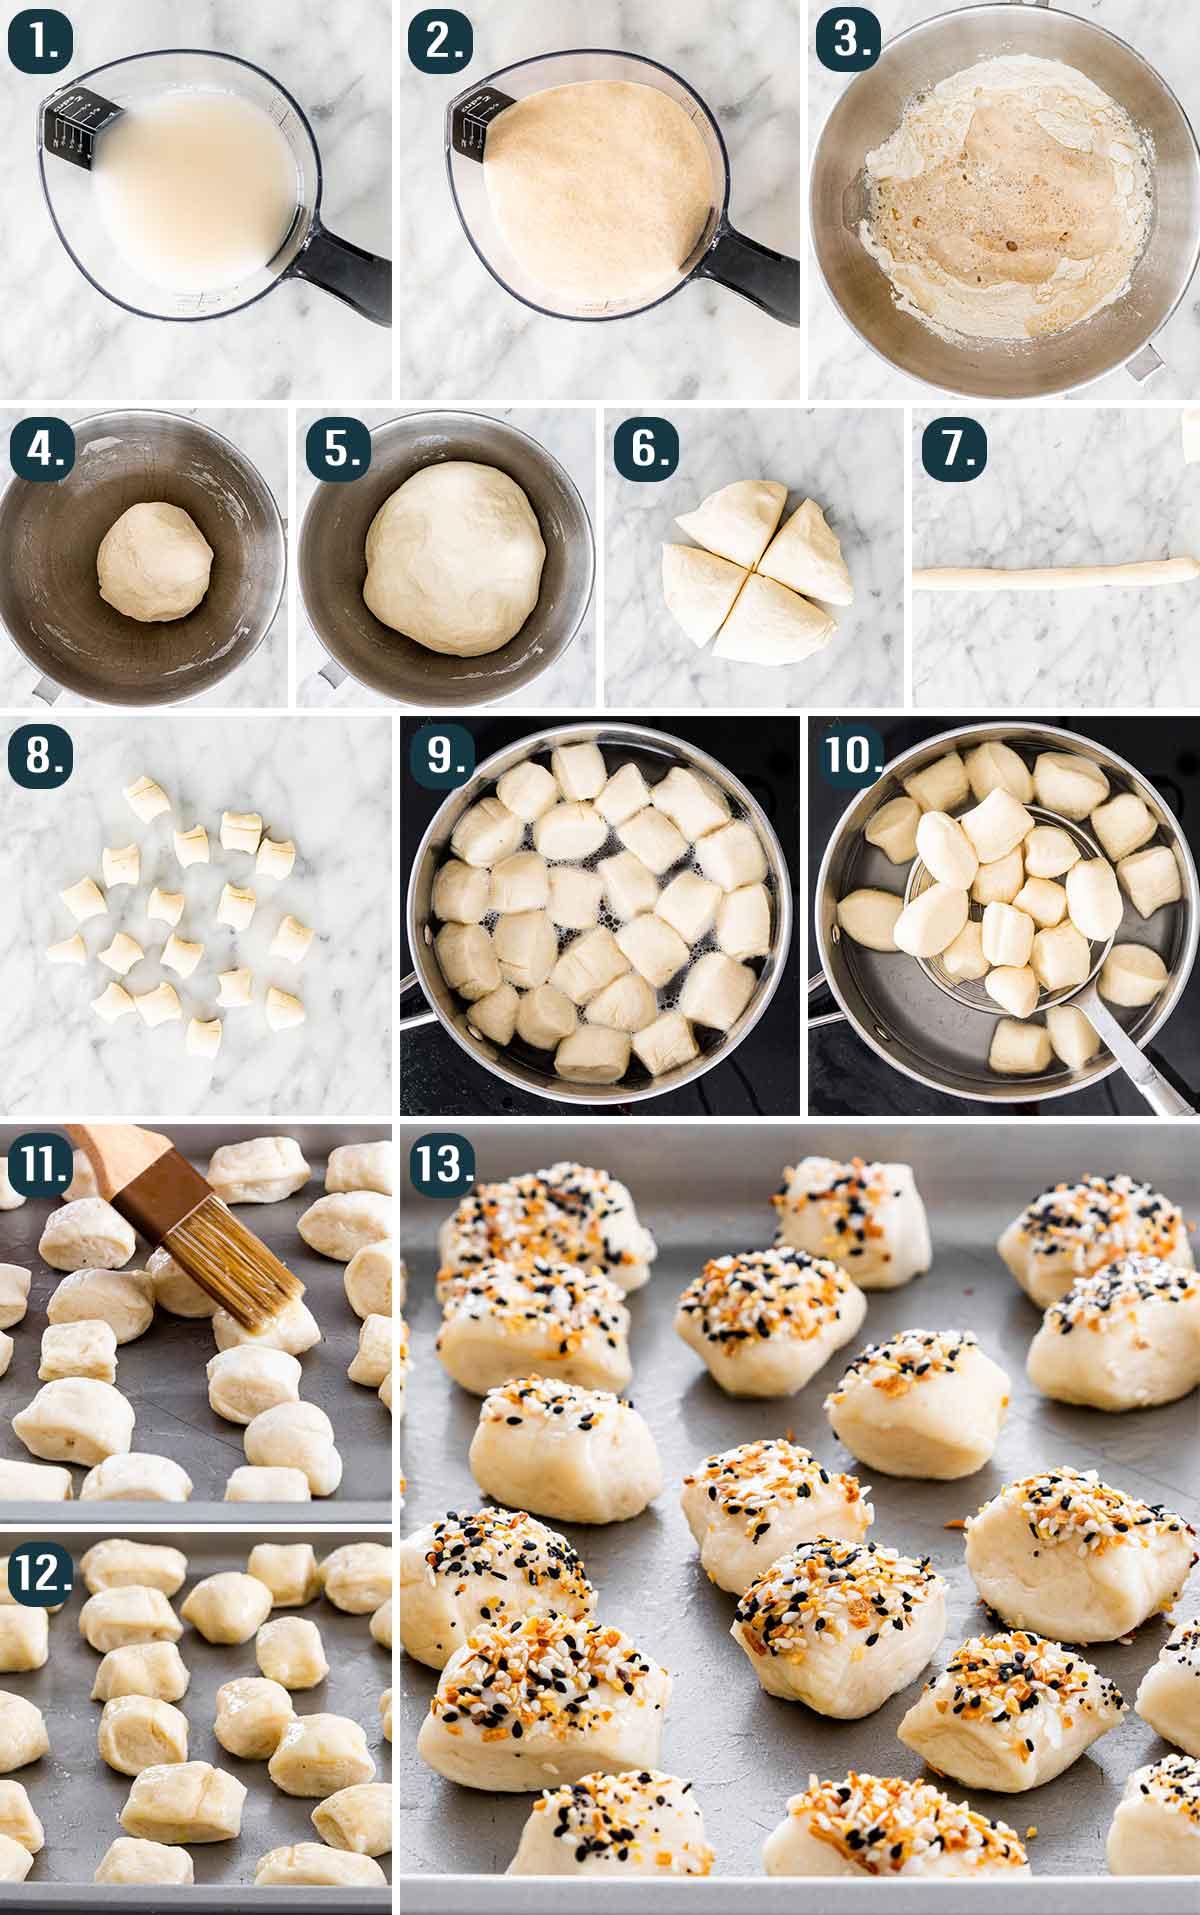 process shots showing how to make pretzel bites